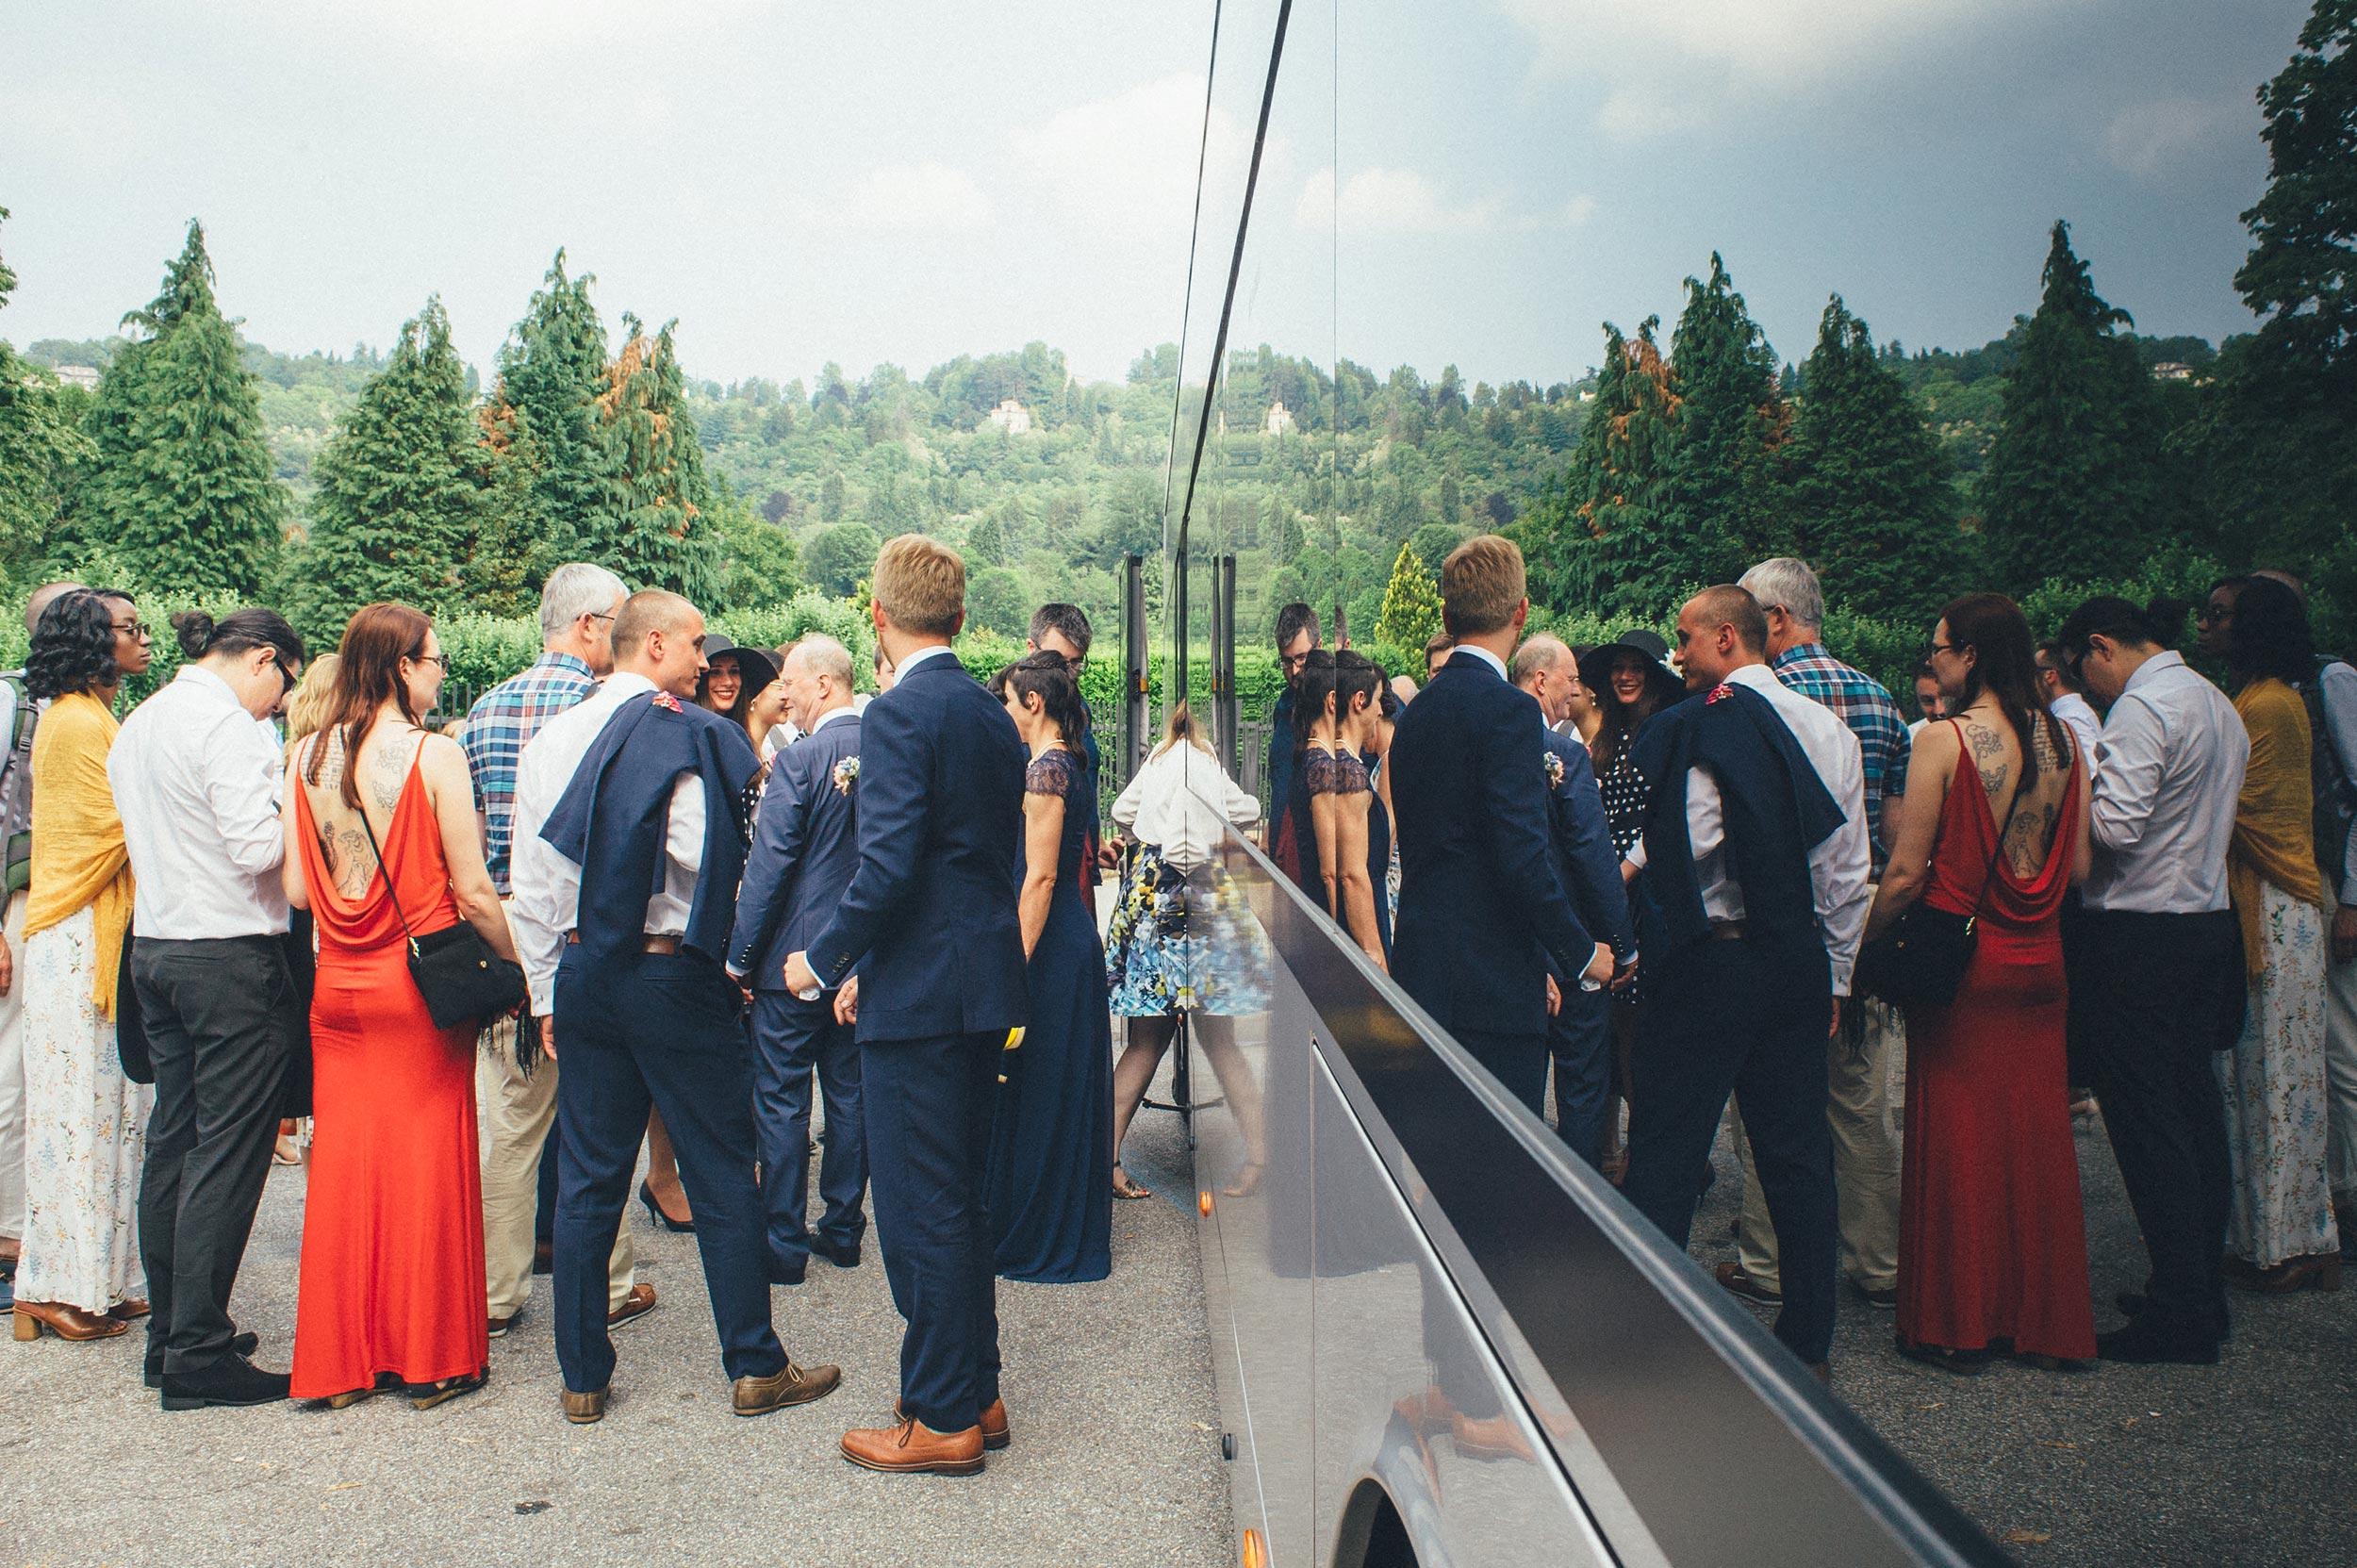 2016-Julius-Silke-Lake-Orta-Wedding-Photographer-Italy-Alessandro-Avenali-74.jpg